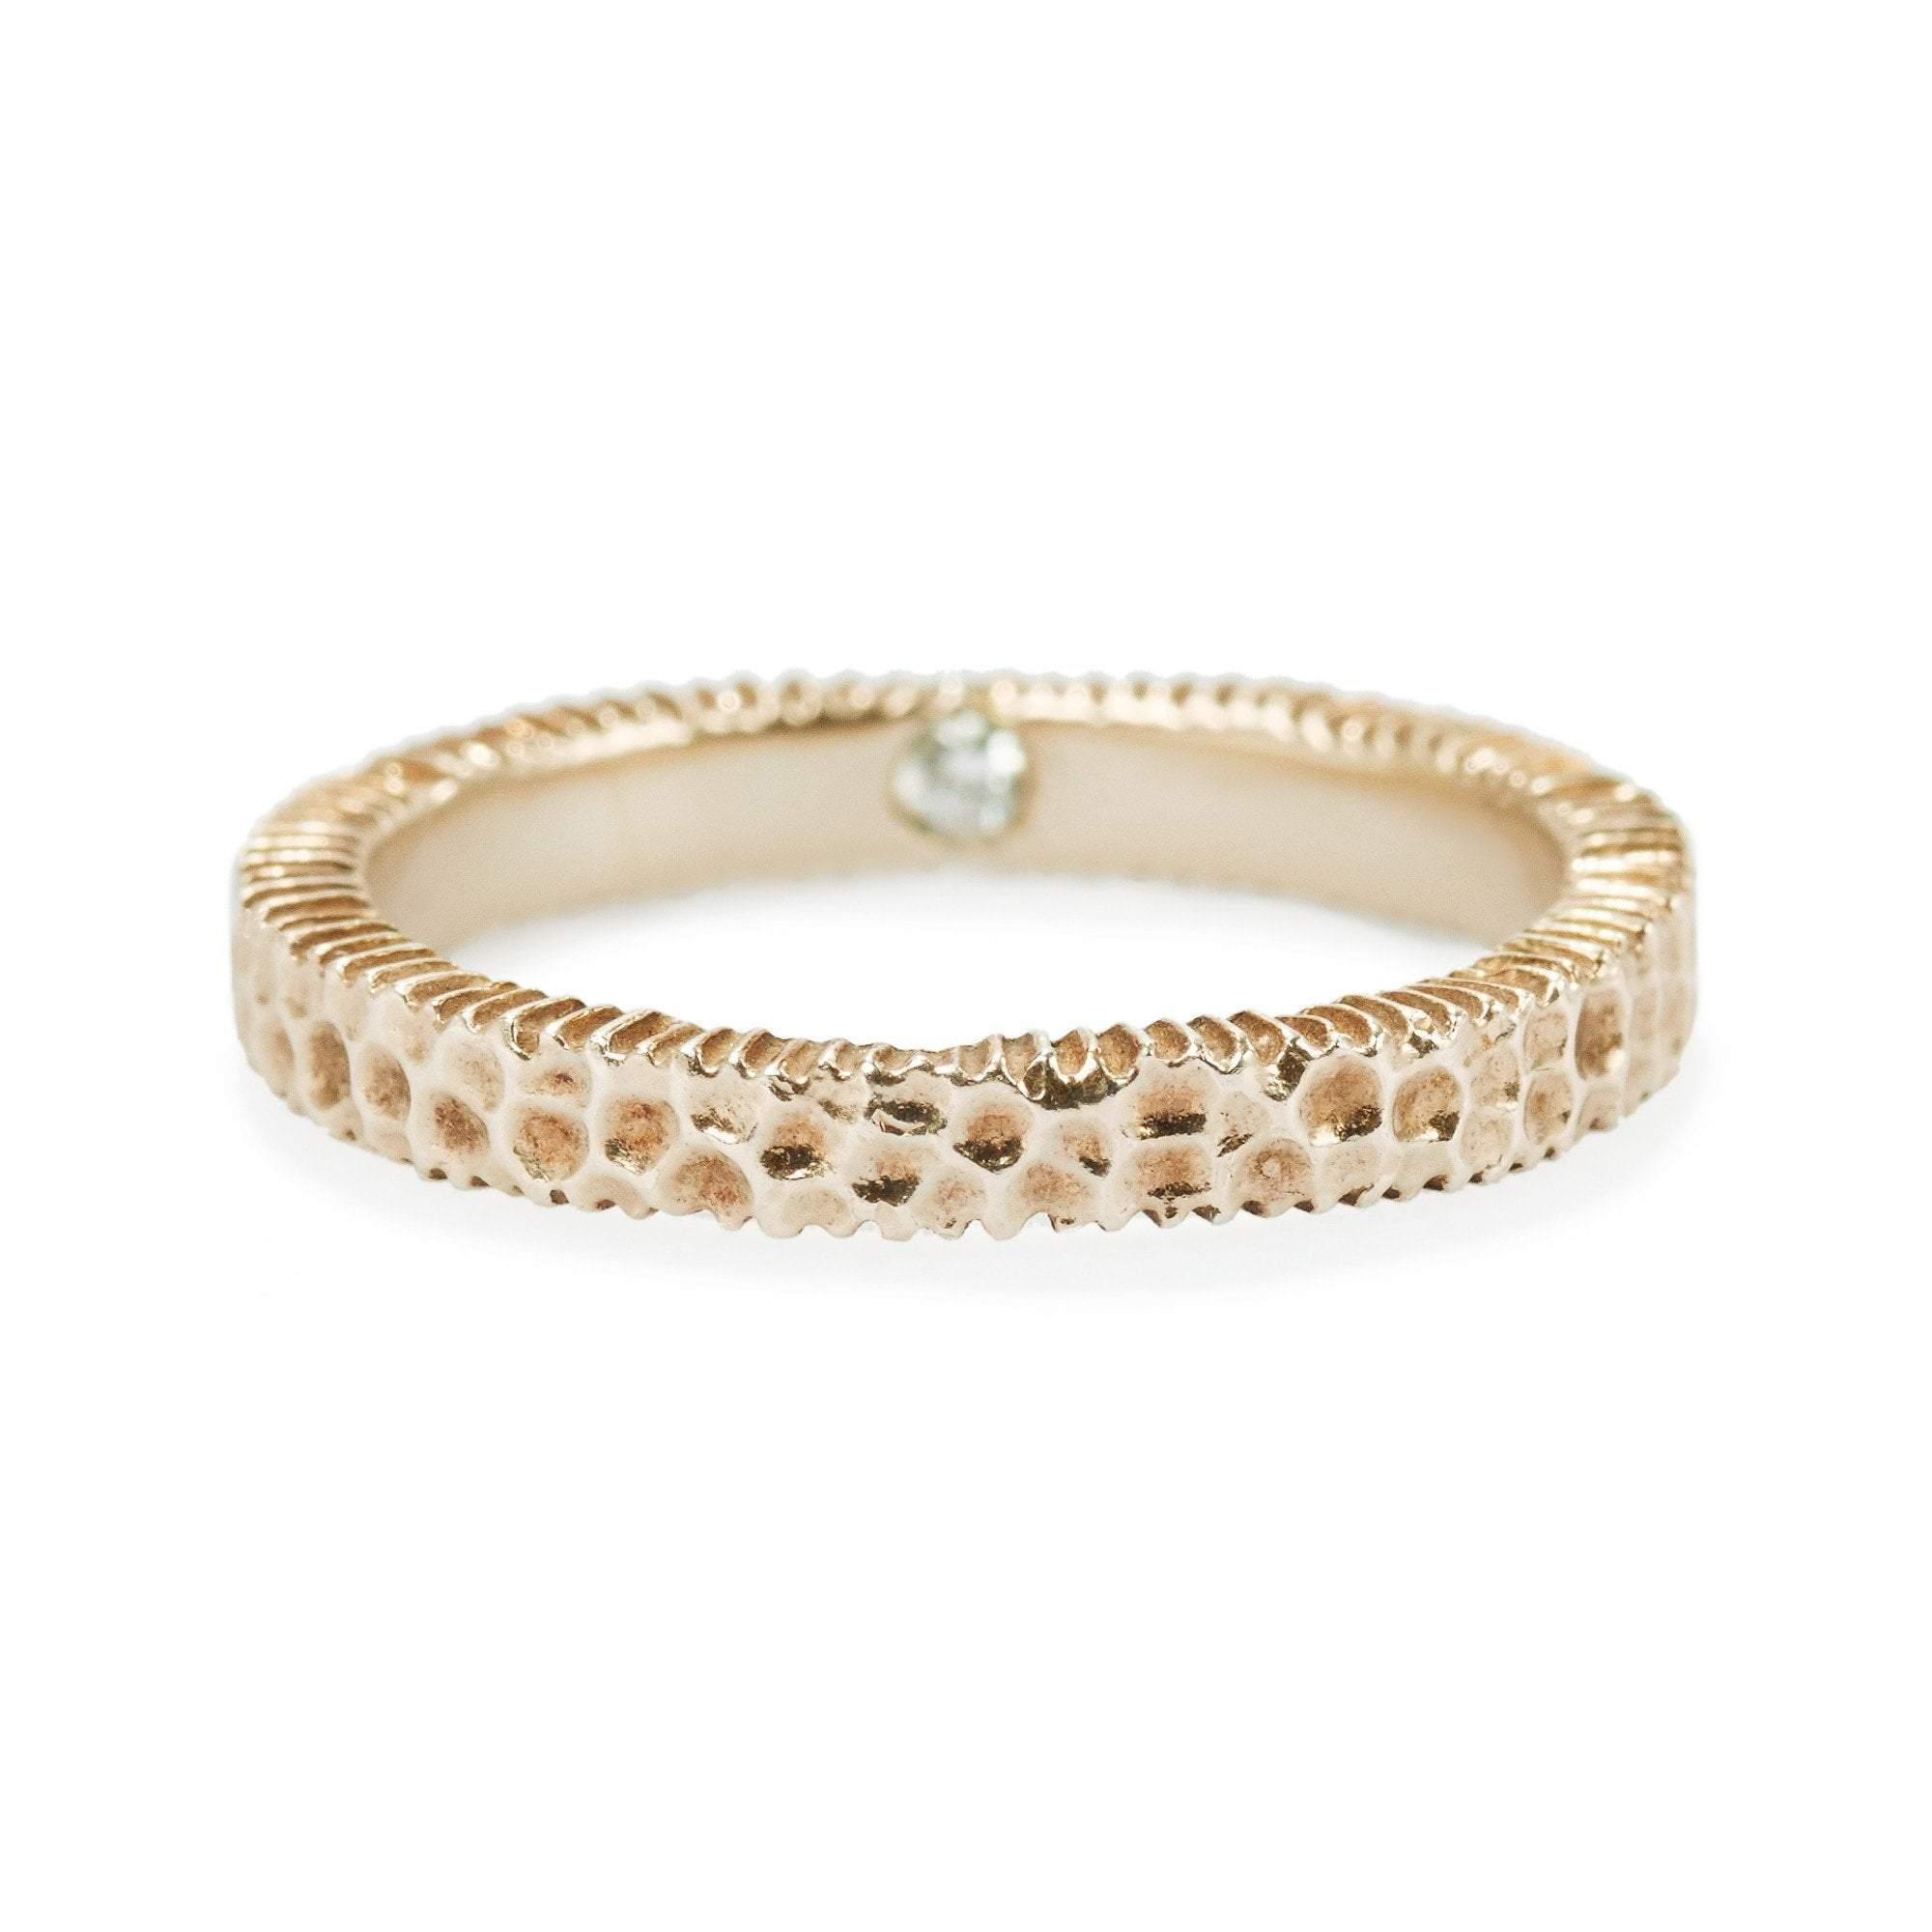 Elizabeth Buenaventura - Hammered Harmony Rose Gold Ring